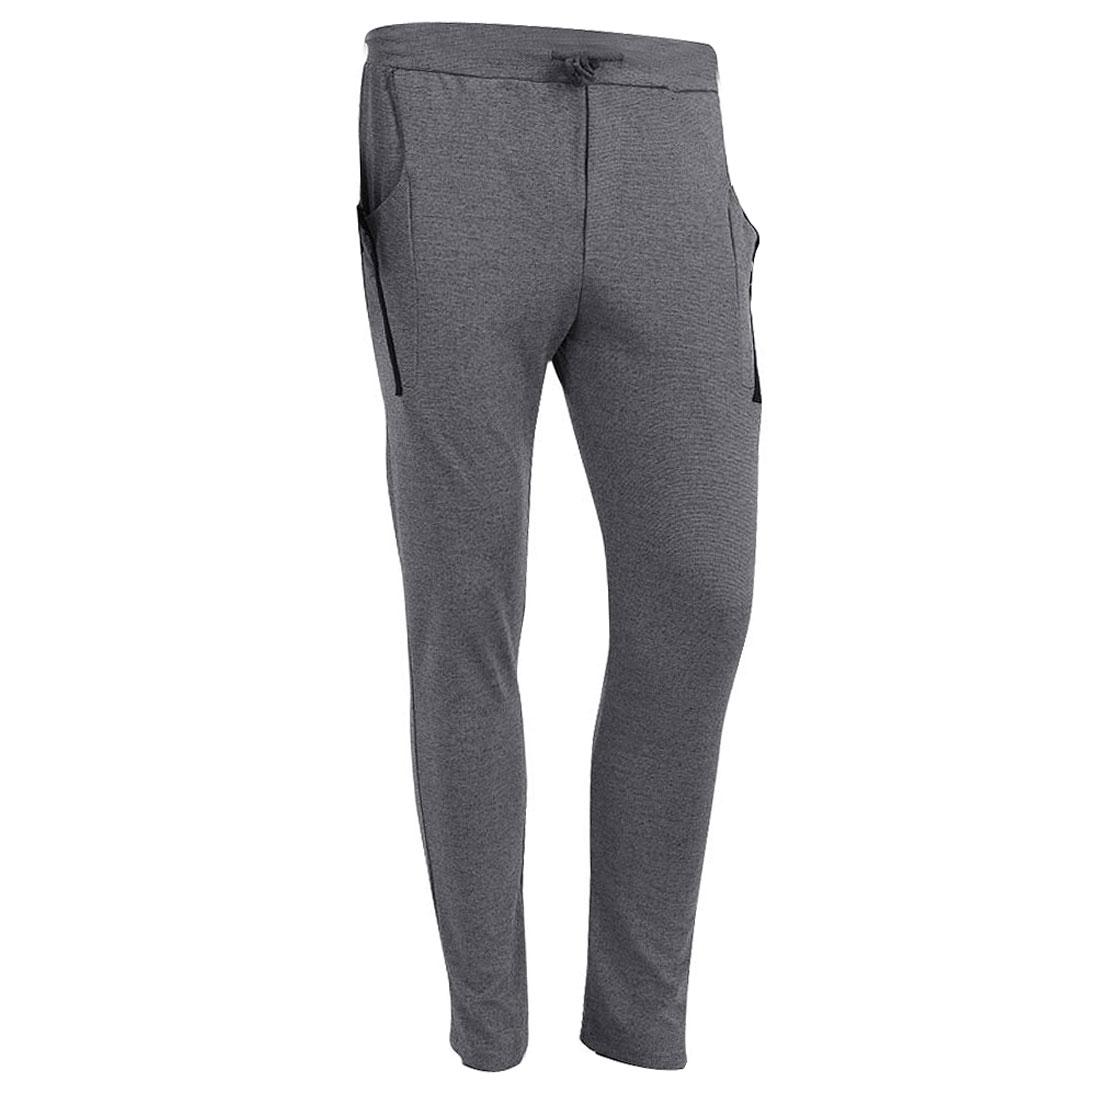 Man Drawstring Hip Pockets Modern Long Fashion Trousers Gray W28